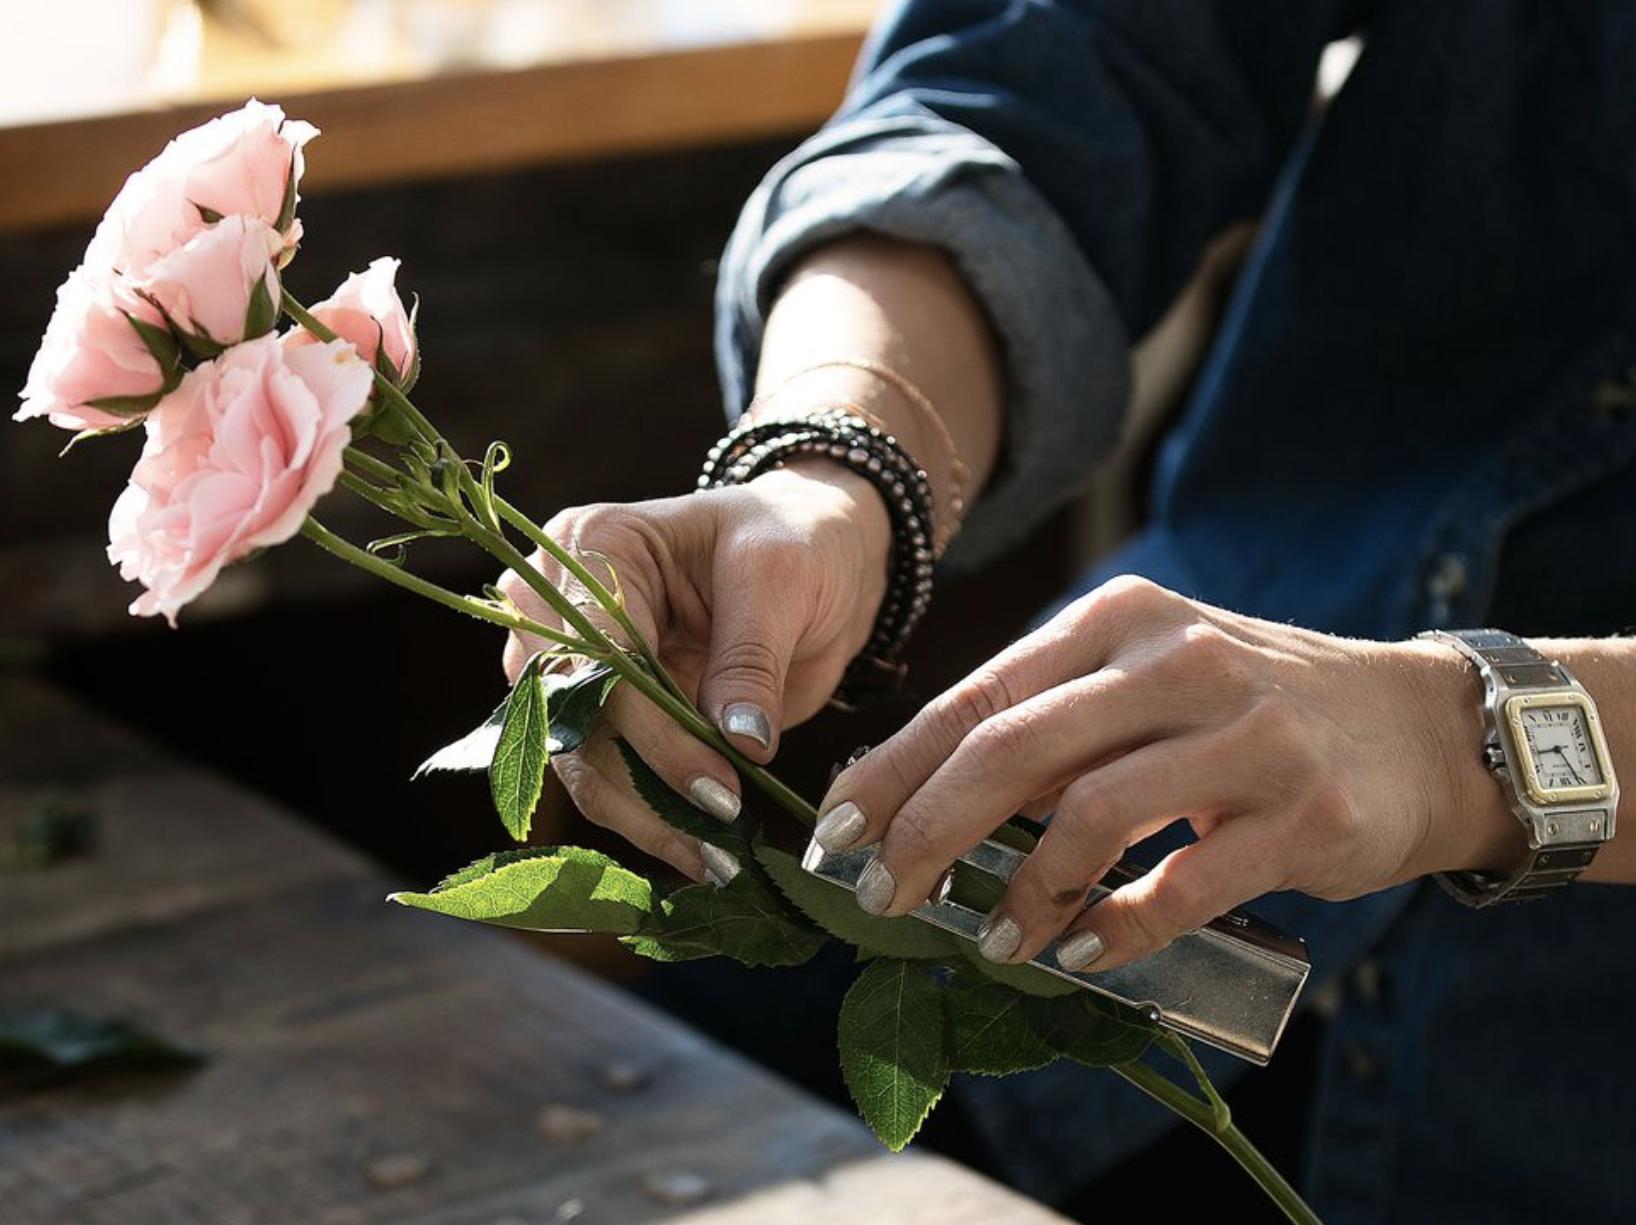 floral-tools-florist-thorn-stripper